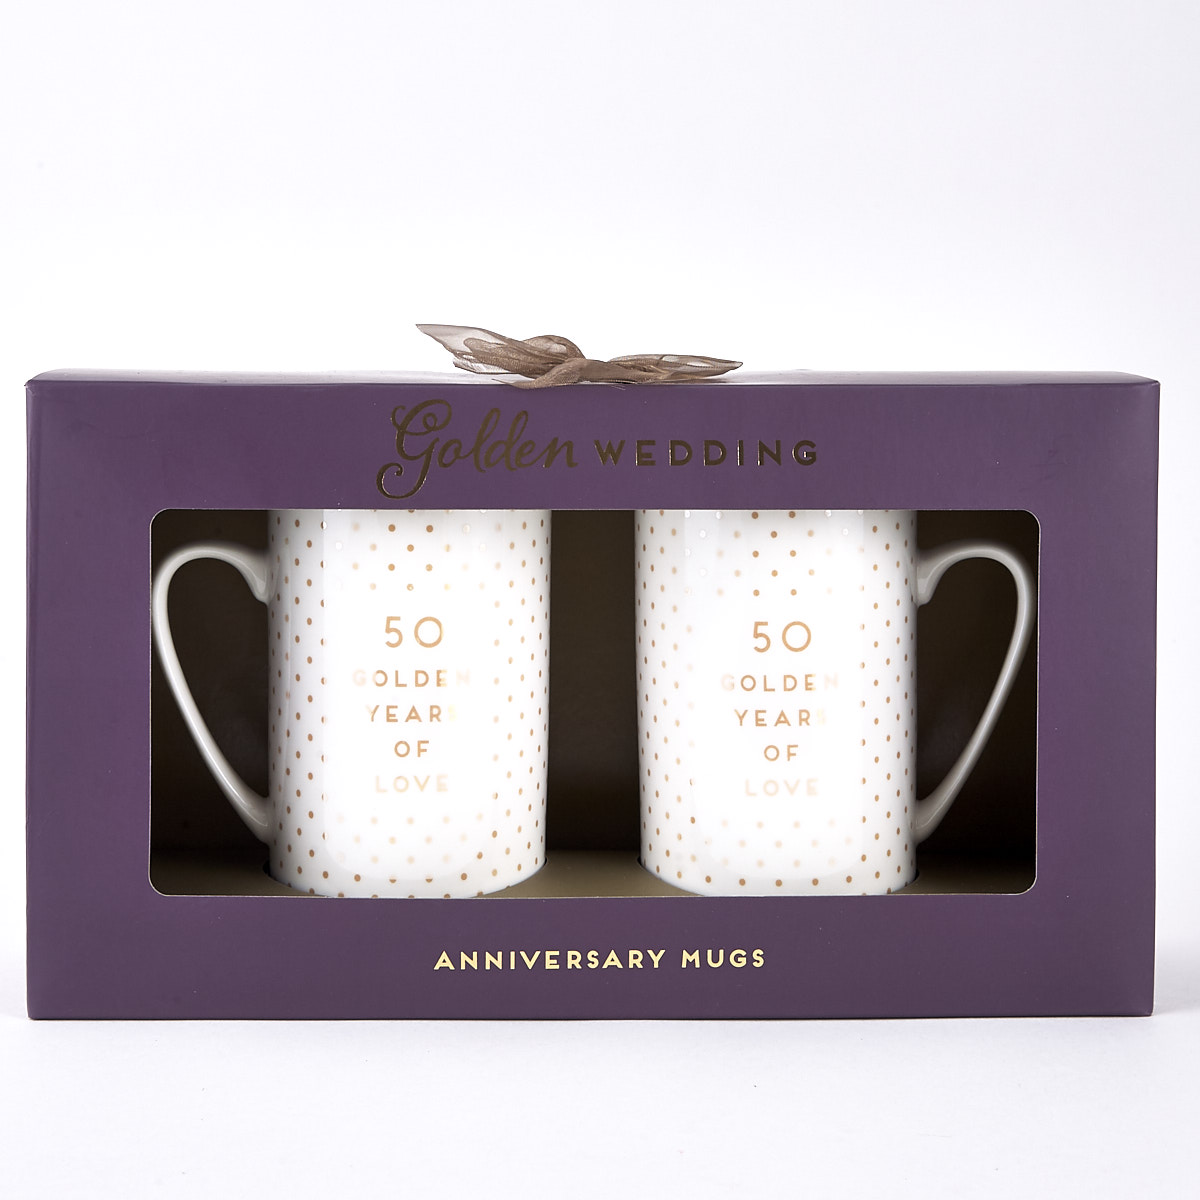 buy golden wedding 50th anniversary mugs for gbp 599